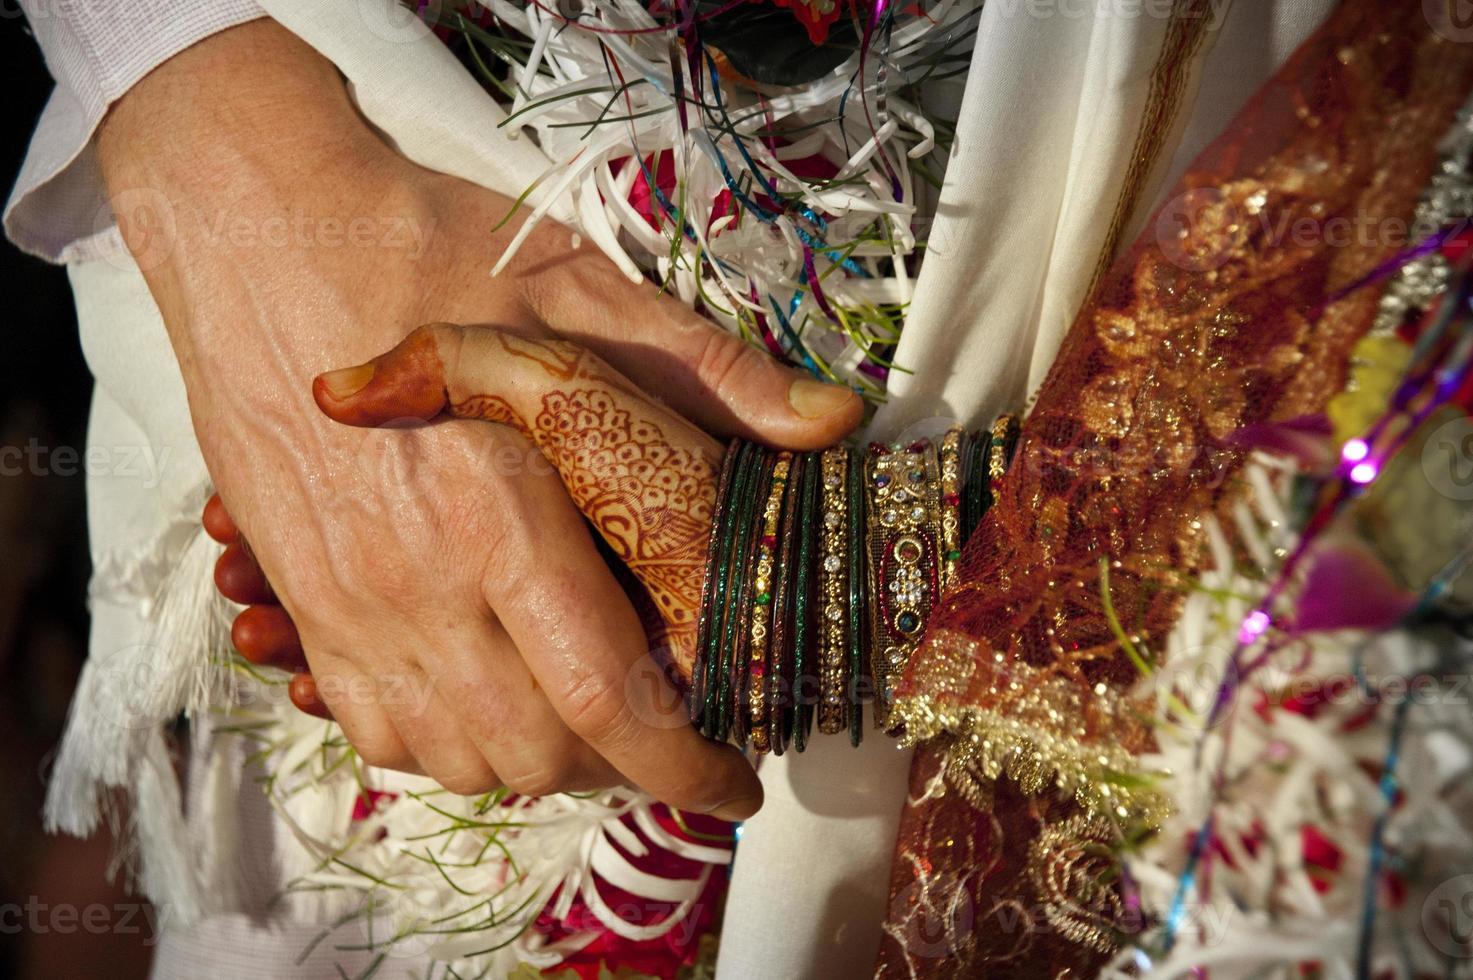 casamento indiano foto